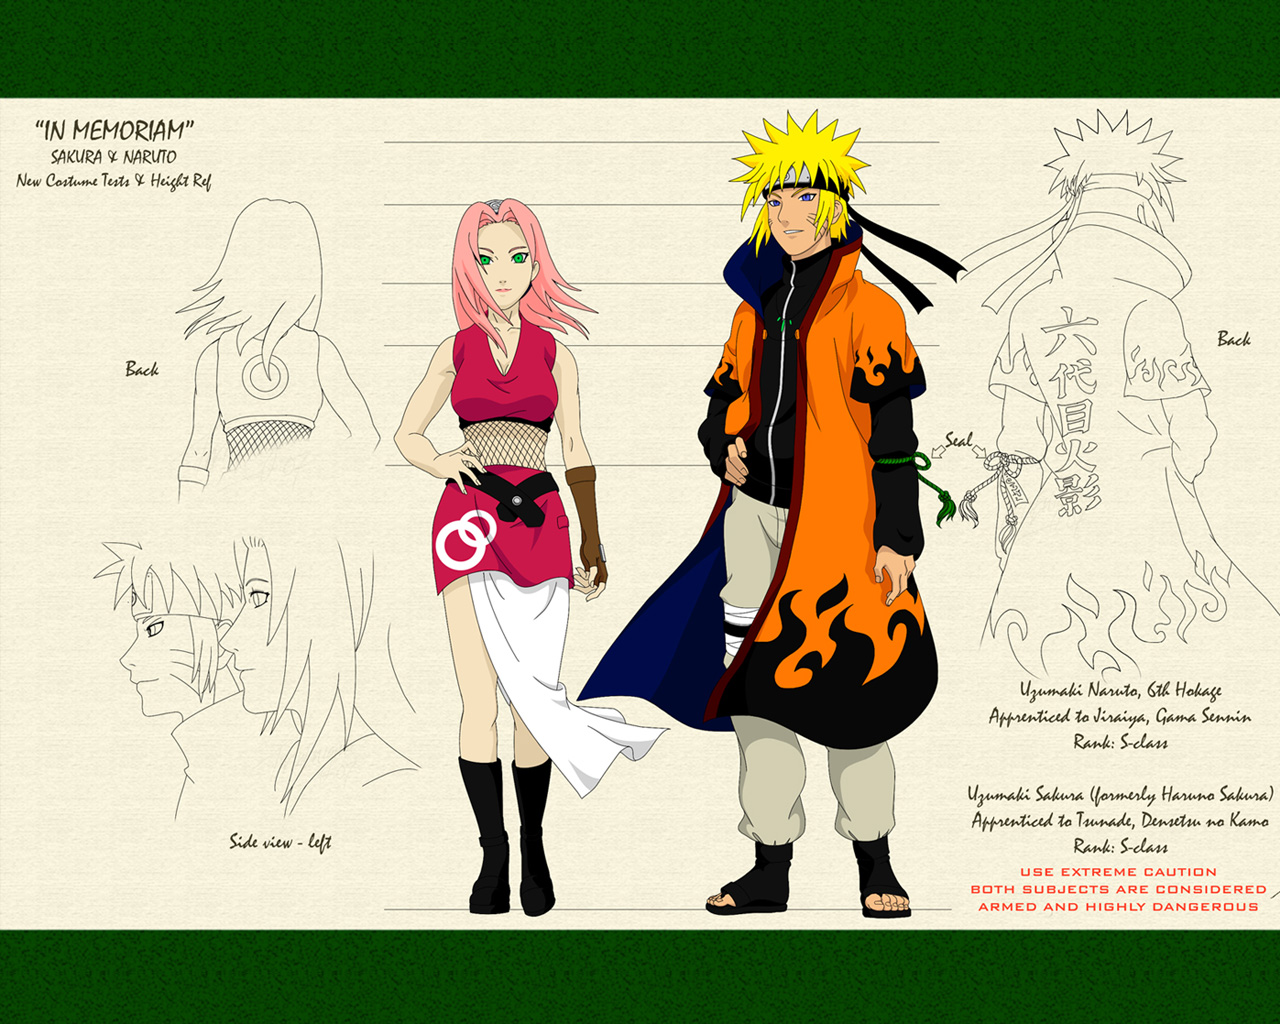 Naruto 6th Hokage Background Image for iPad   Cartoons Wallpapers 1280x1024